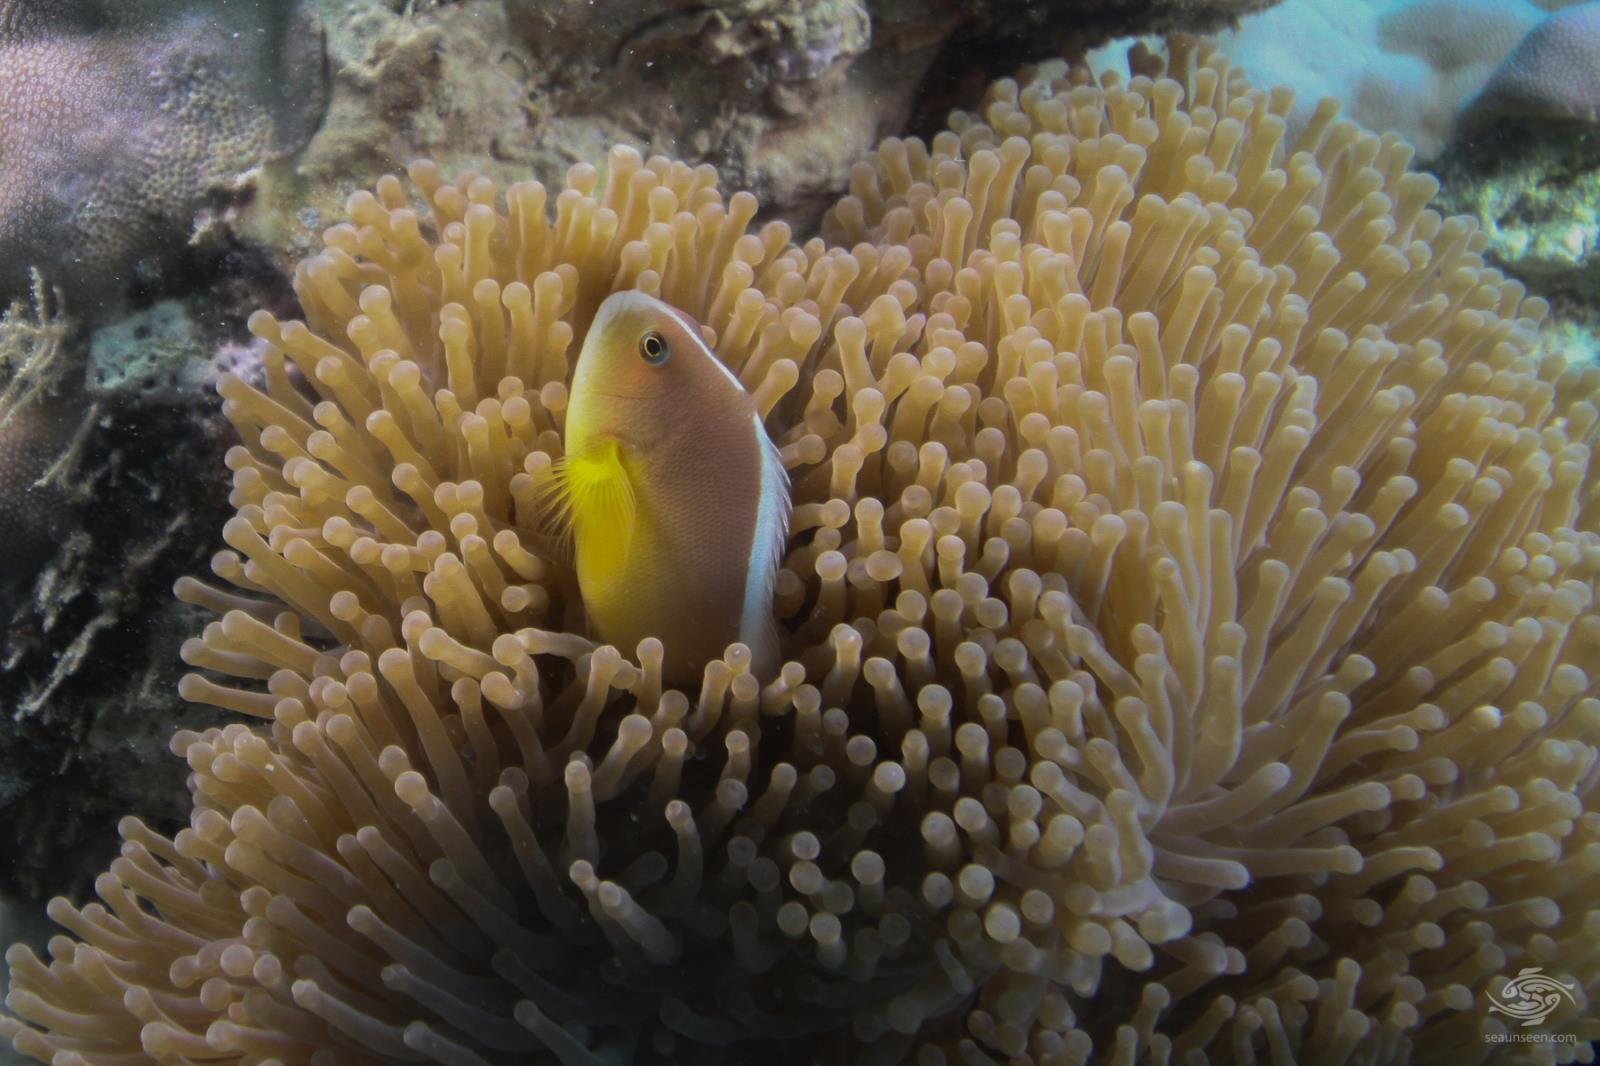 Skunk clownfish or nosestripe anemonefish Amphiprion akallopisos Tanzania 3